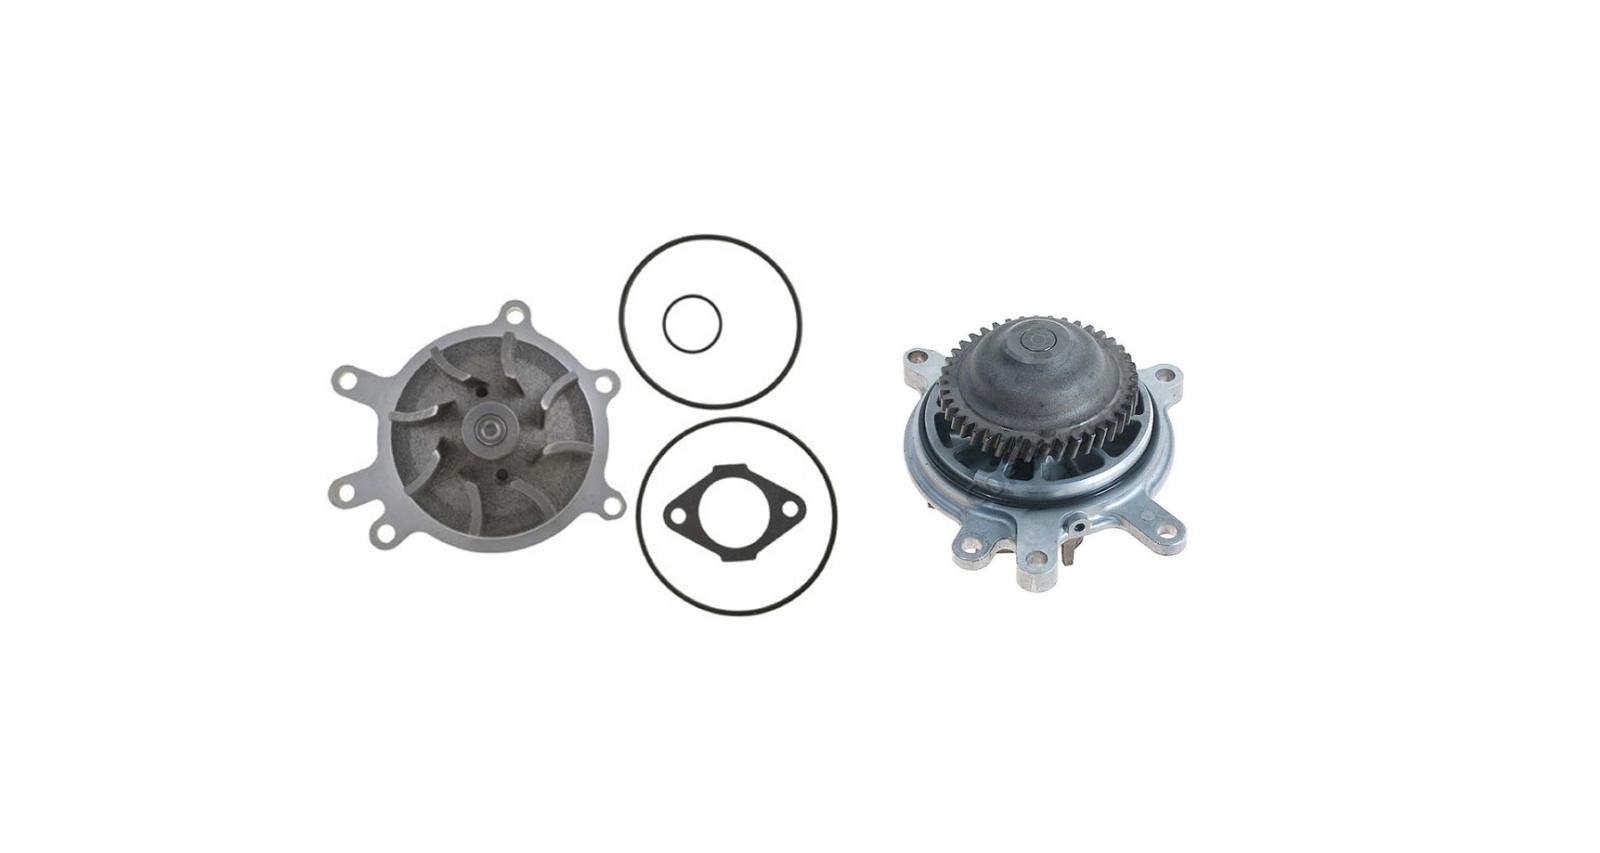 Gm 6 6l Turbosel Ck Info Below Us Motor Works Us